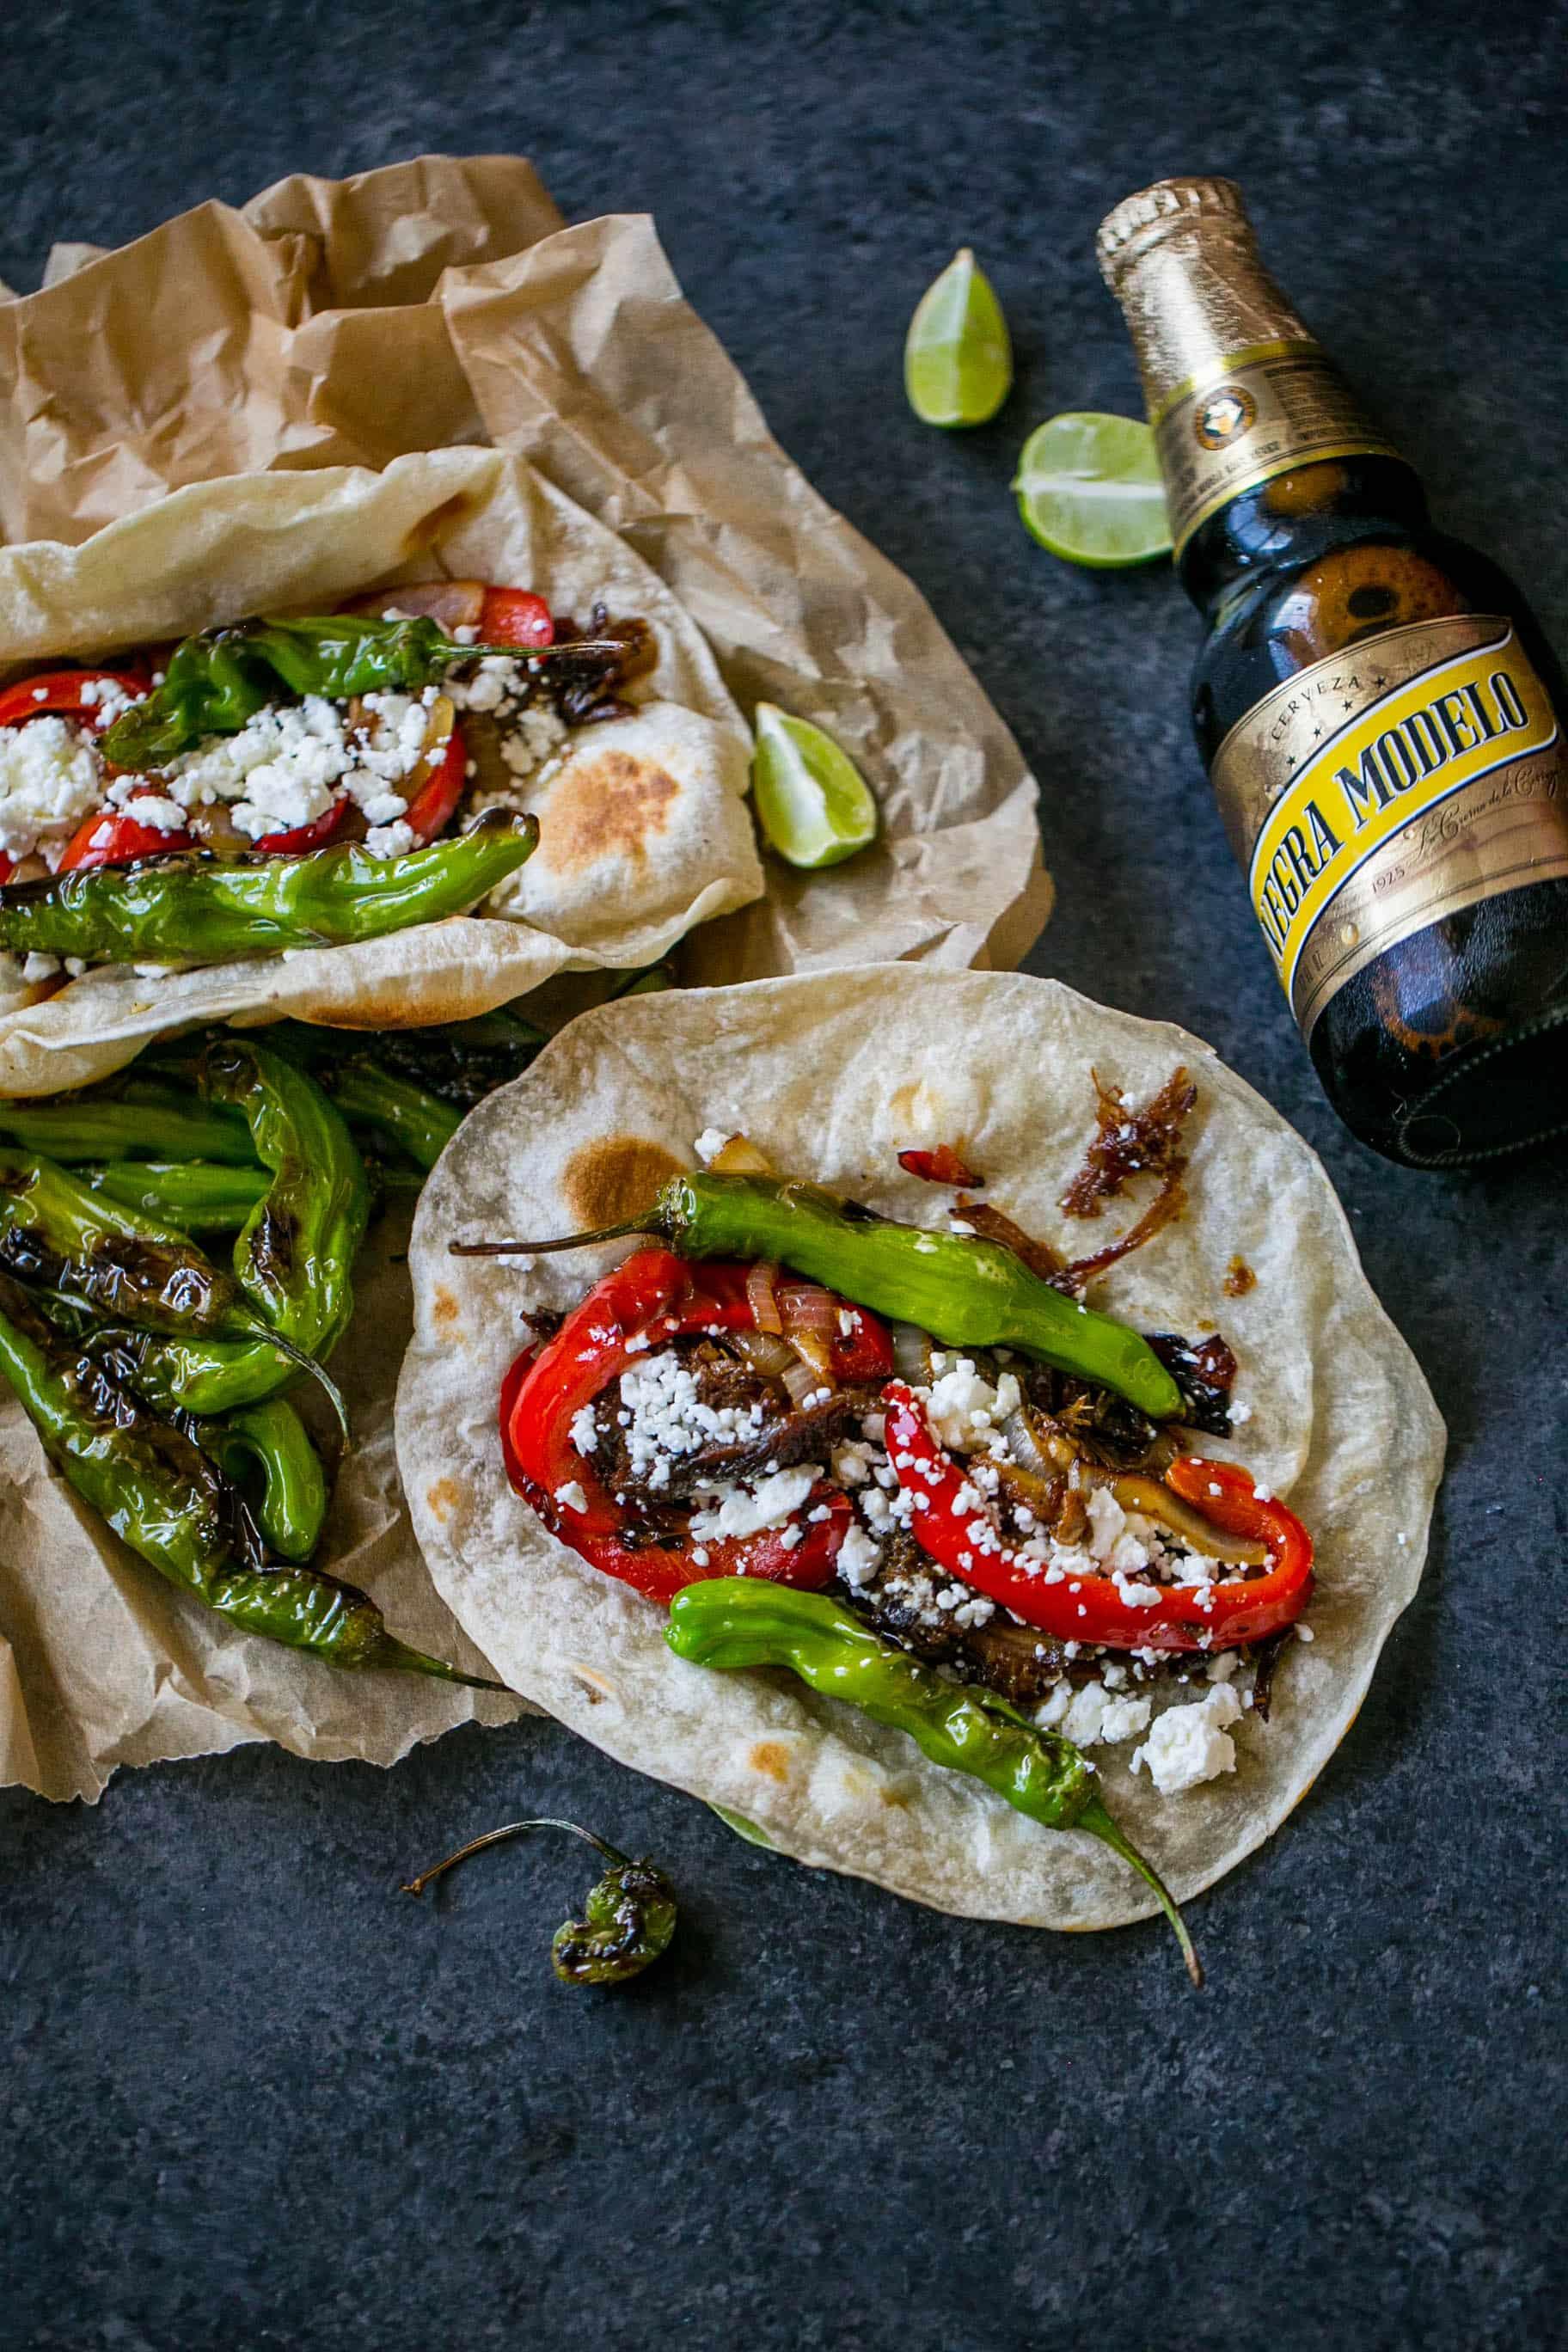 Tequila habanero braised short rib tacos - YUM!